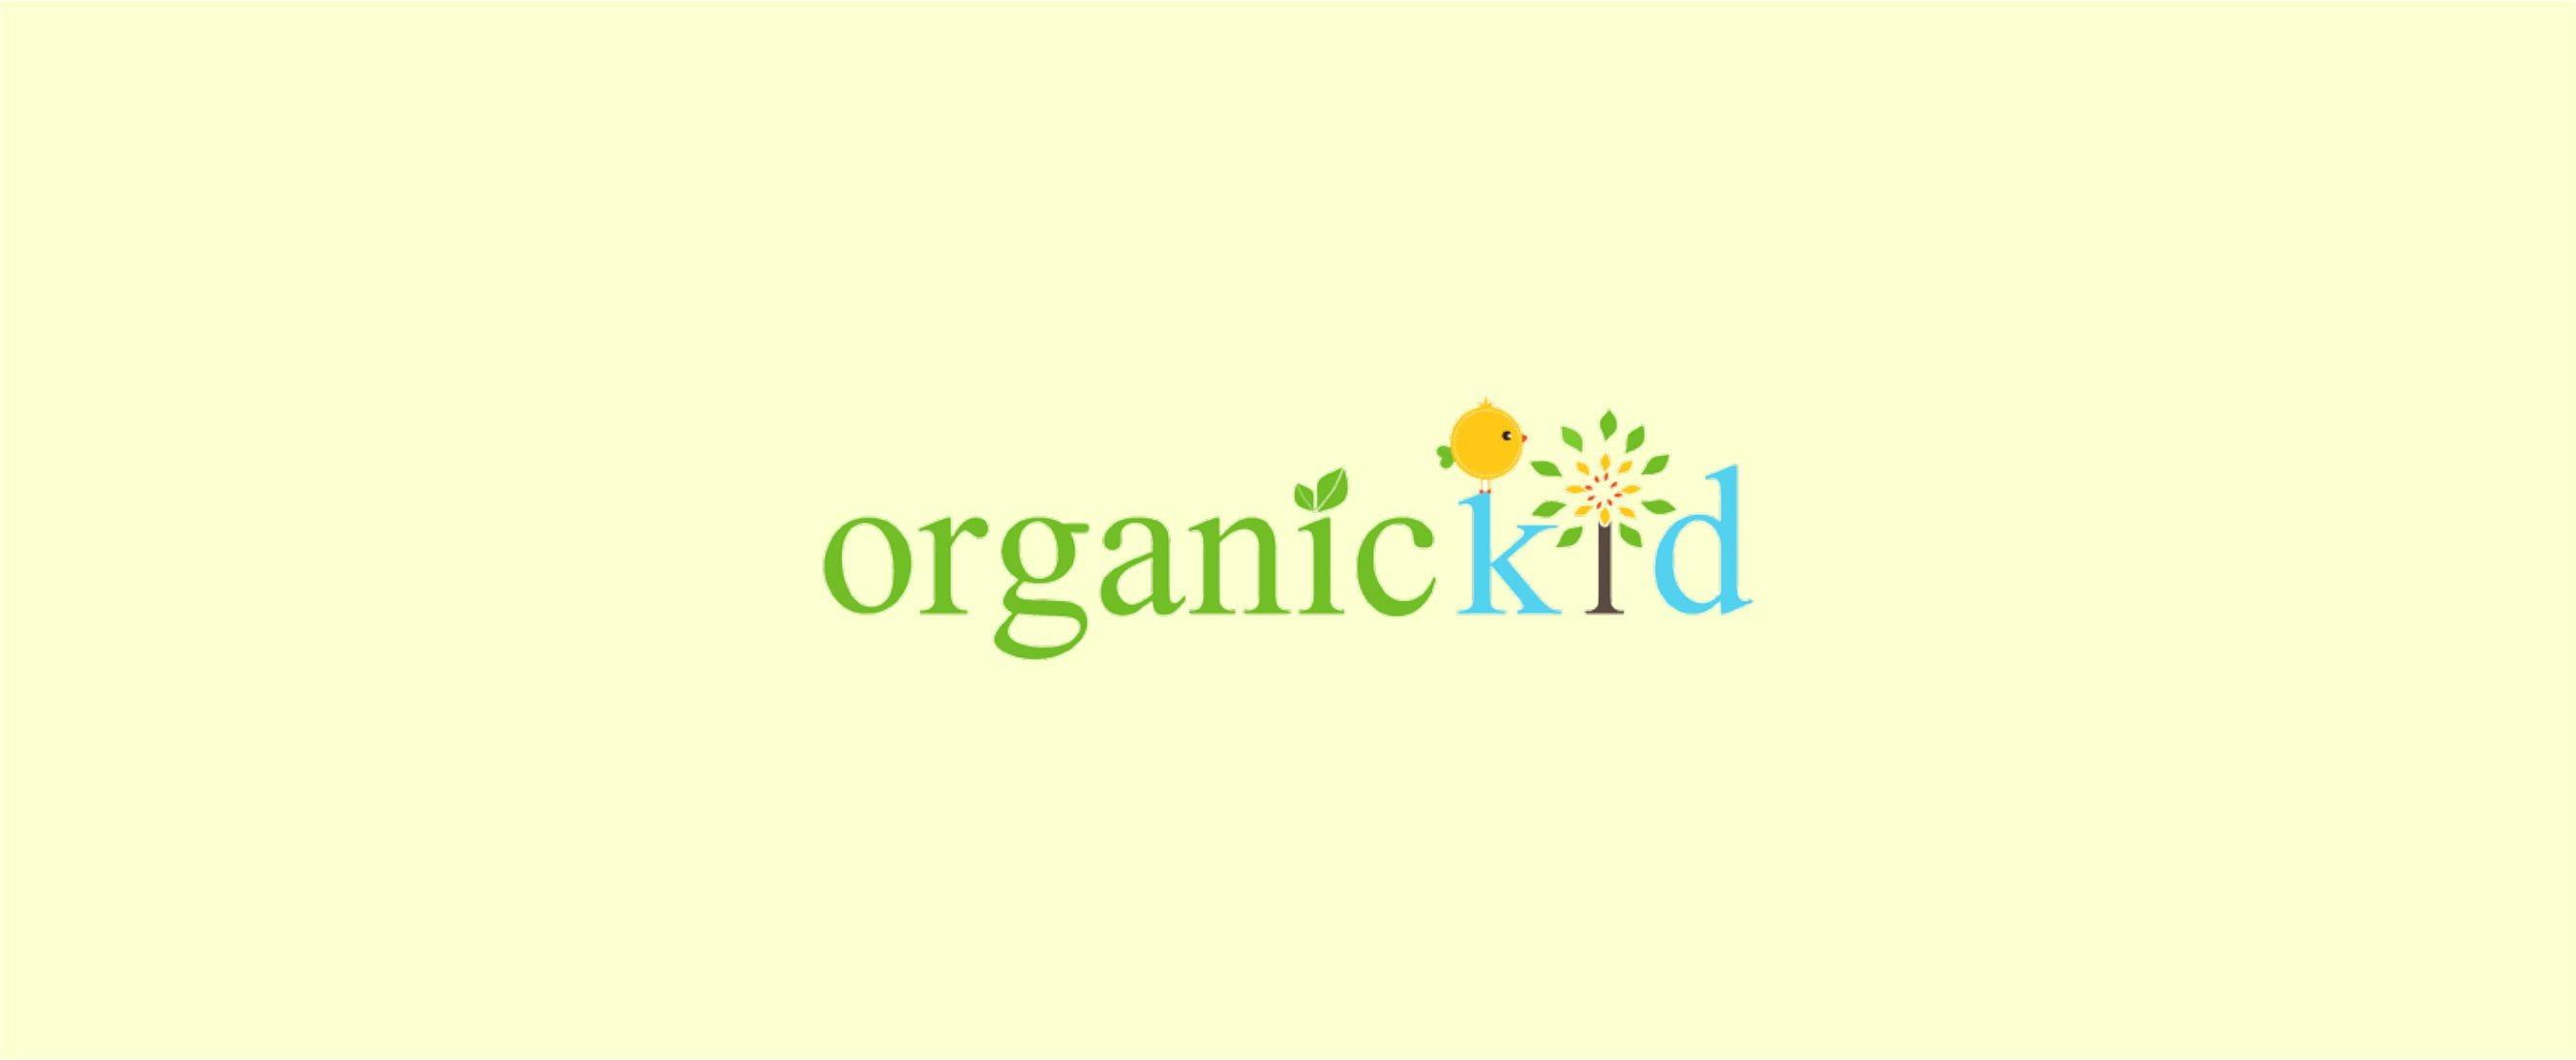 ORGANIC KID ✔️ Бебешки дрехи ᐉ ТОП Цени — Kidsfasion.bg